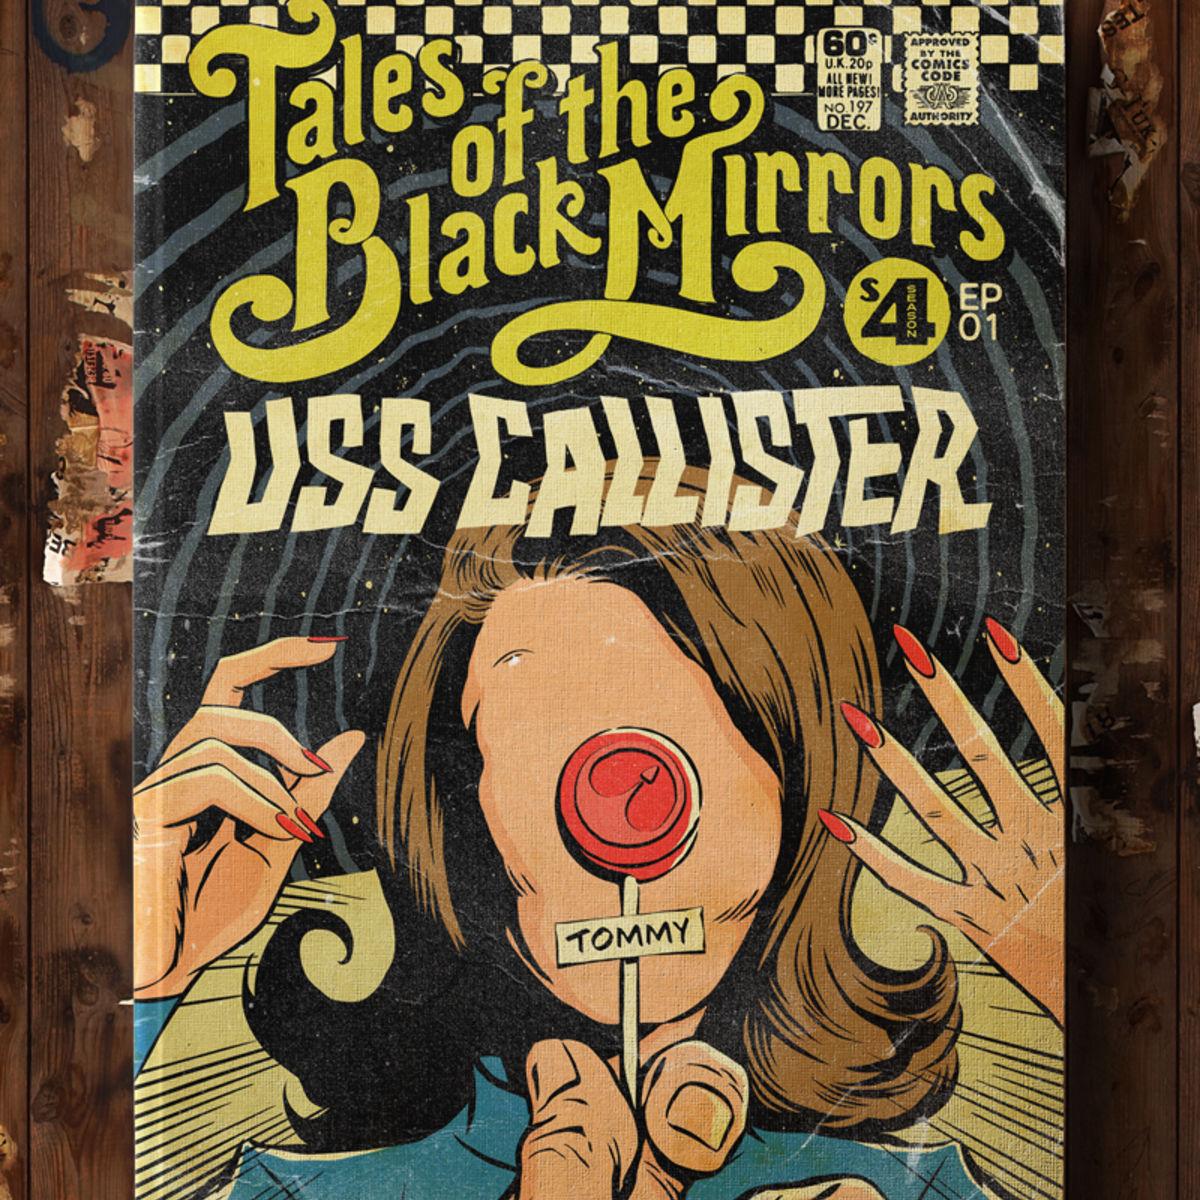 black-mirror-butch-billy-1.jpg